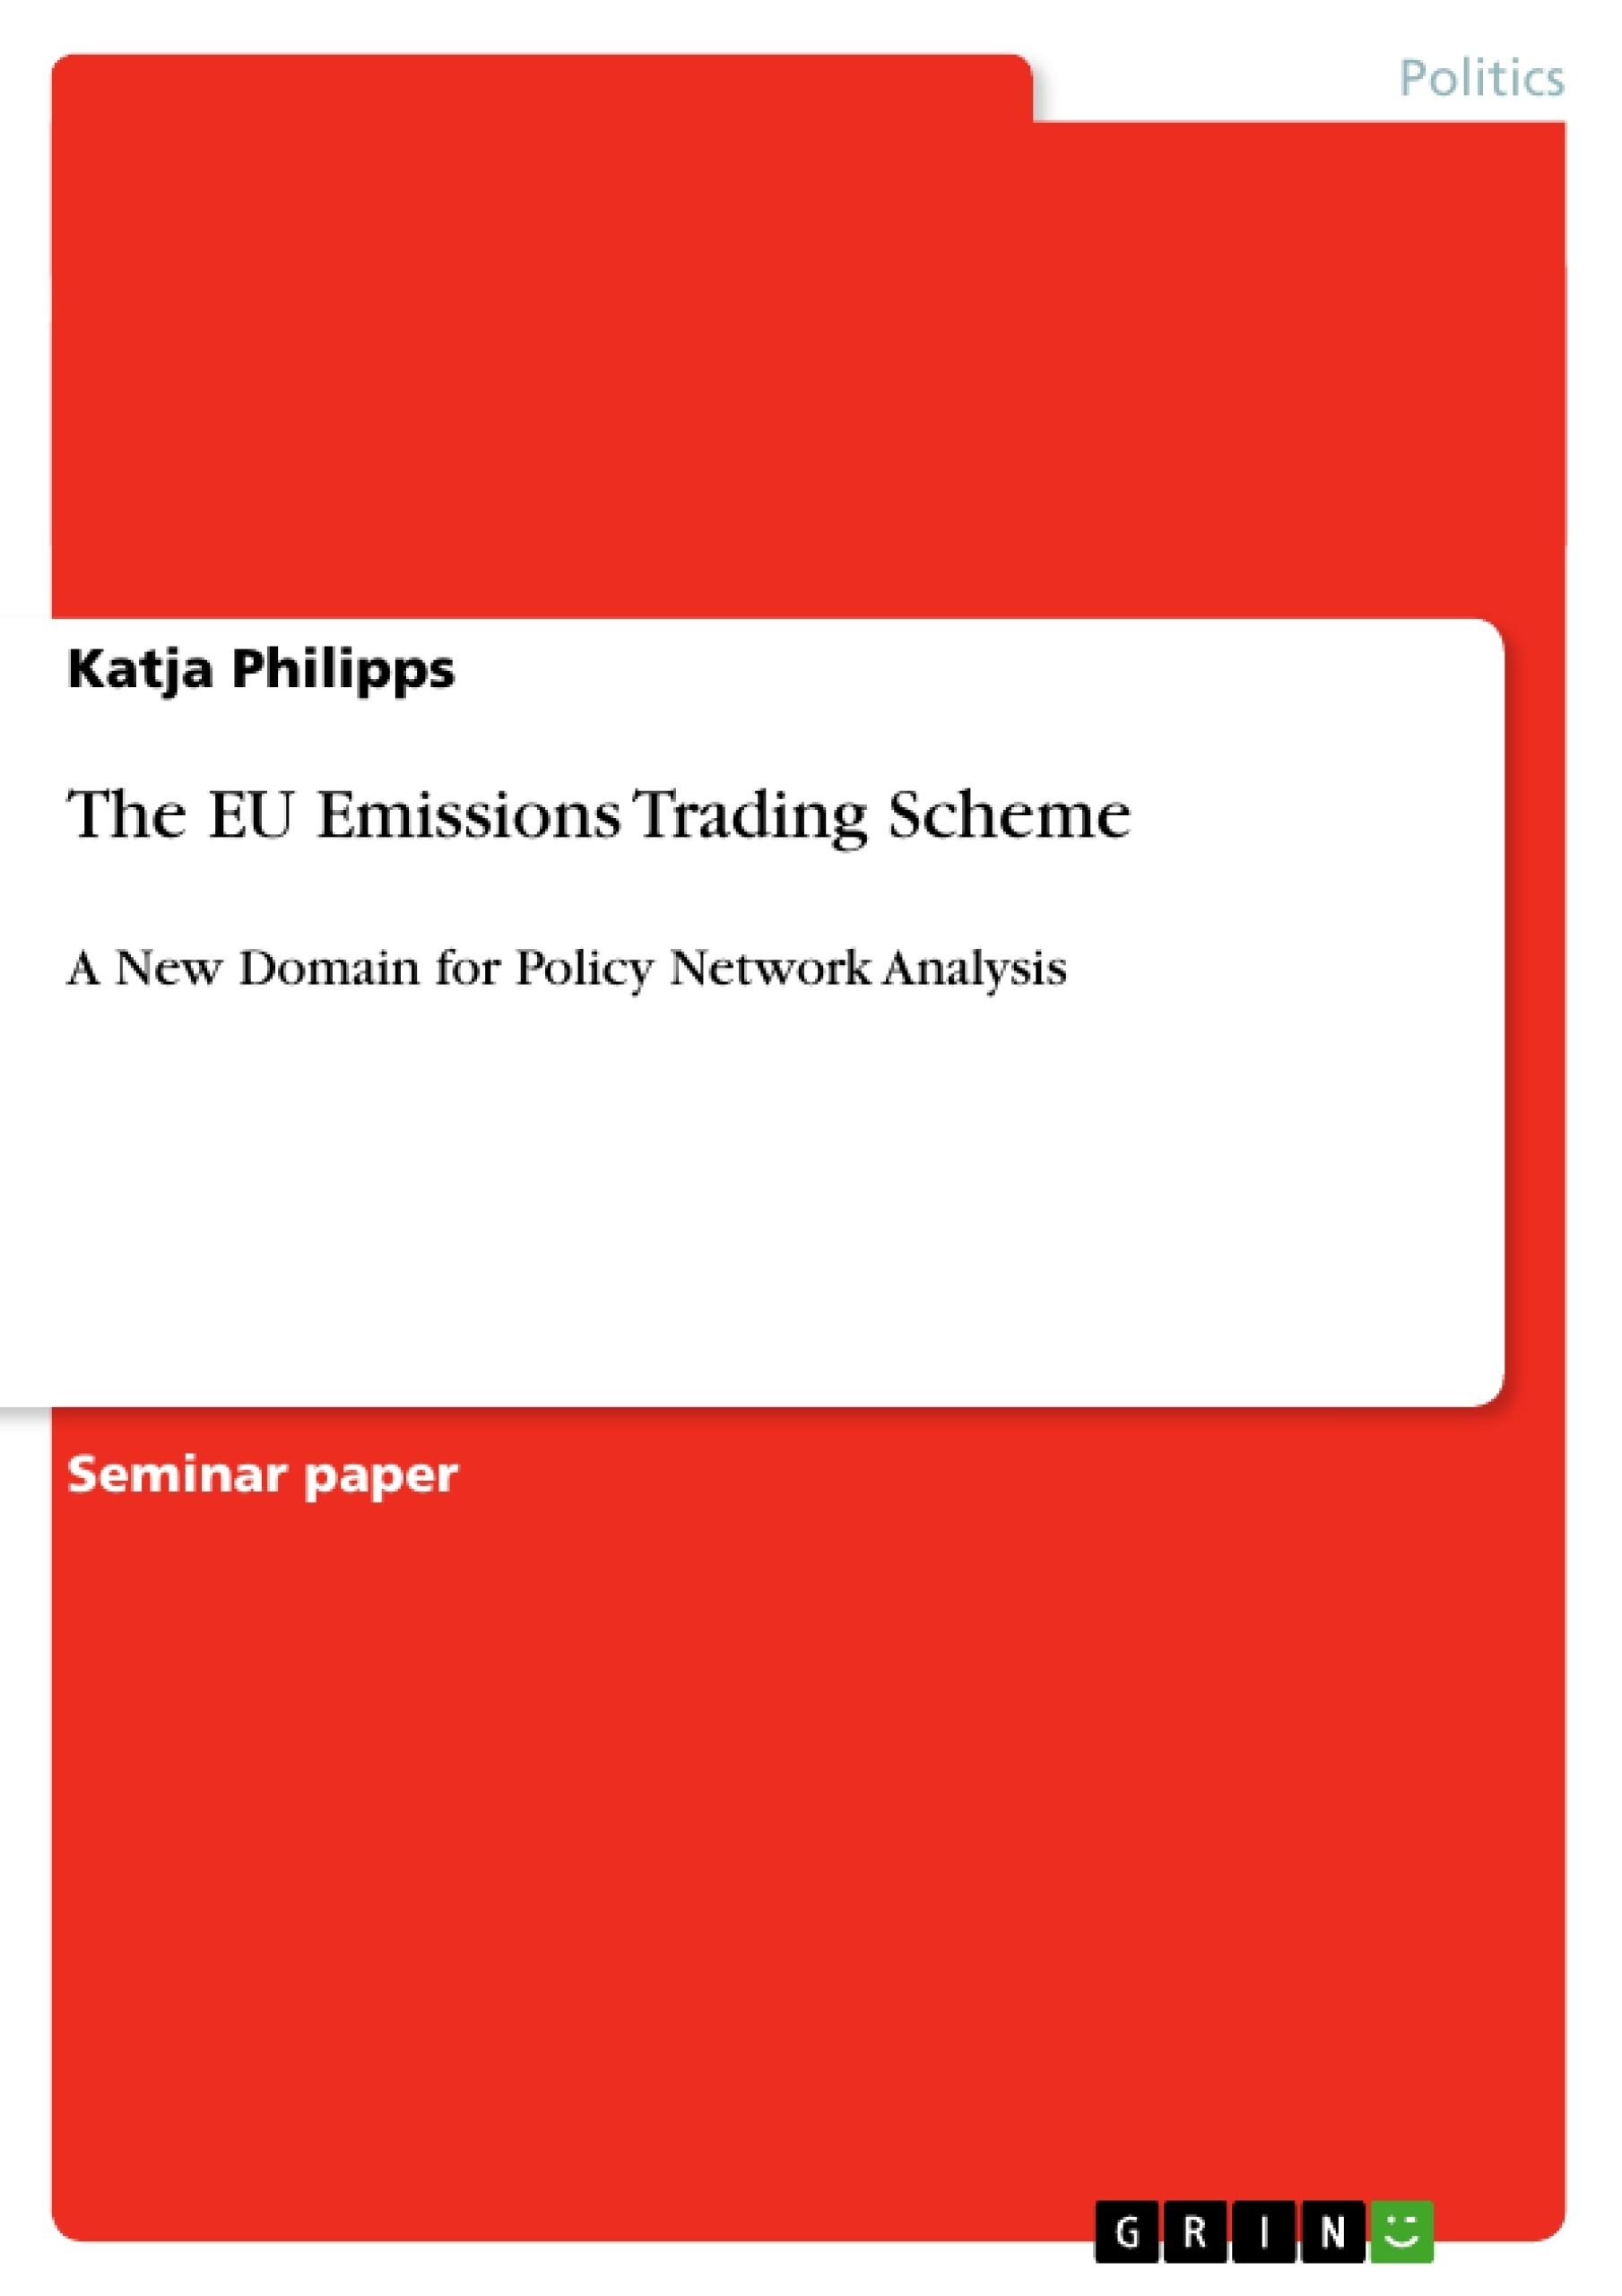 Title: The EU Emissions Trading Scheme